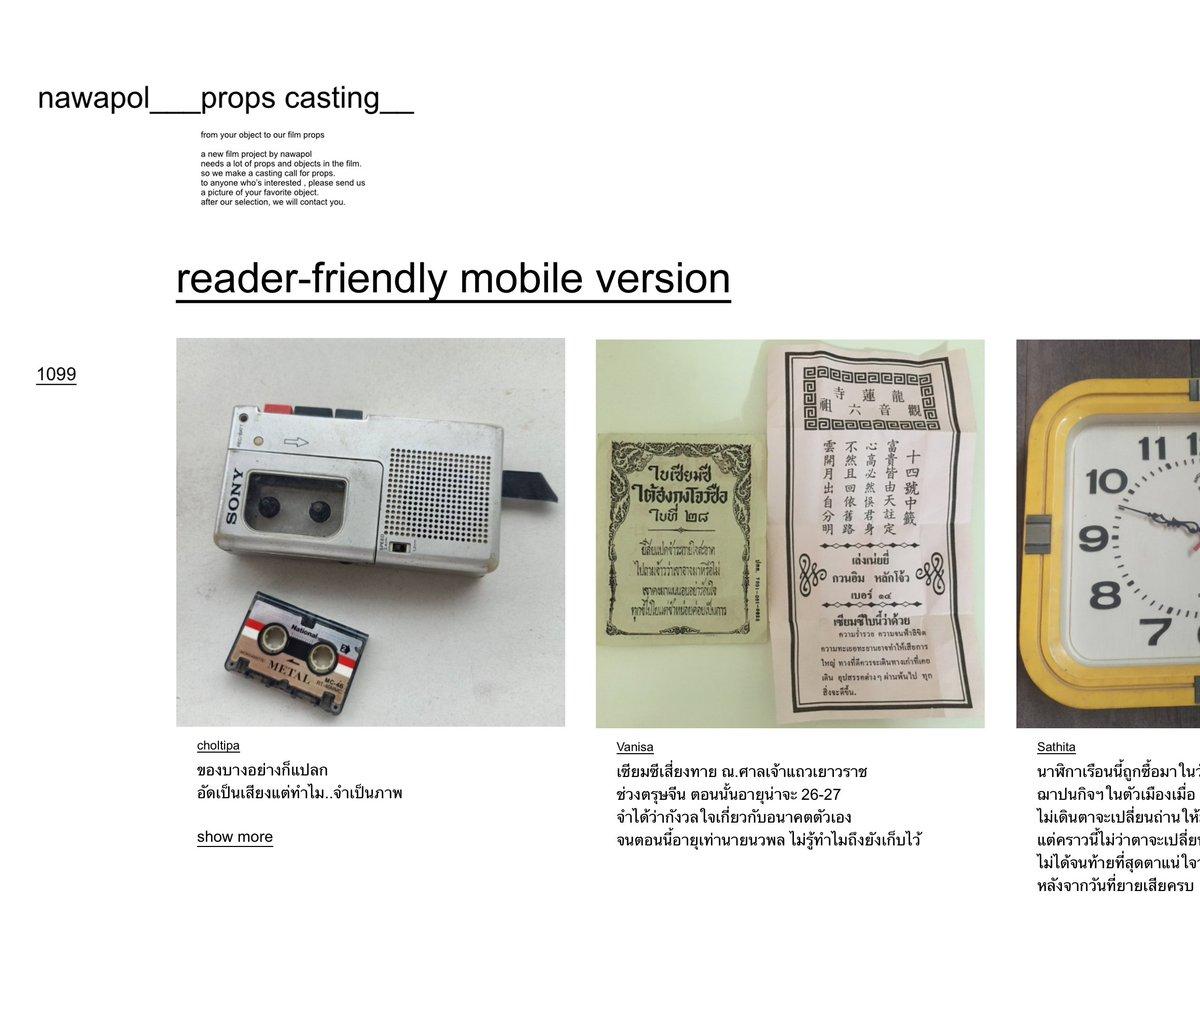 HAPPY OLD YEAR : PROPS CASTING / reader-friendly version ฉลองครบ 1,100 ชิ้น ด้วยการปรับเว็บไซต์เว็บไซต์ฉบับมือถือให้มีเลย์เอาท์อ่านง่ายๆเหมือนกับ instagram // จากเว็บไซต์ส่งพร็อพมาแคสท์ ตอนนี้กลายเป็นเว็บไซต์คอนเทนท์ไปละ 555 #happyoldyear #propscasting  http://nawapolpropscasting.com